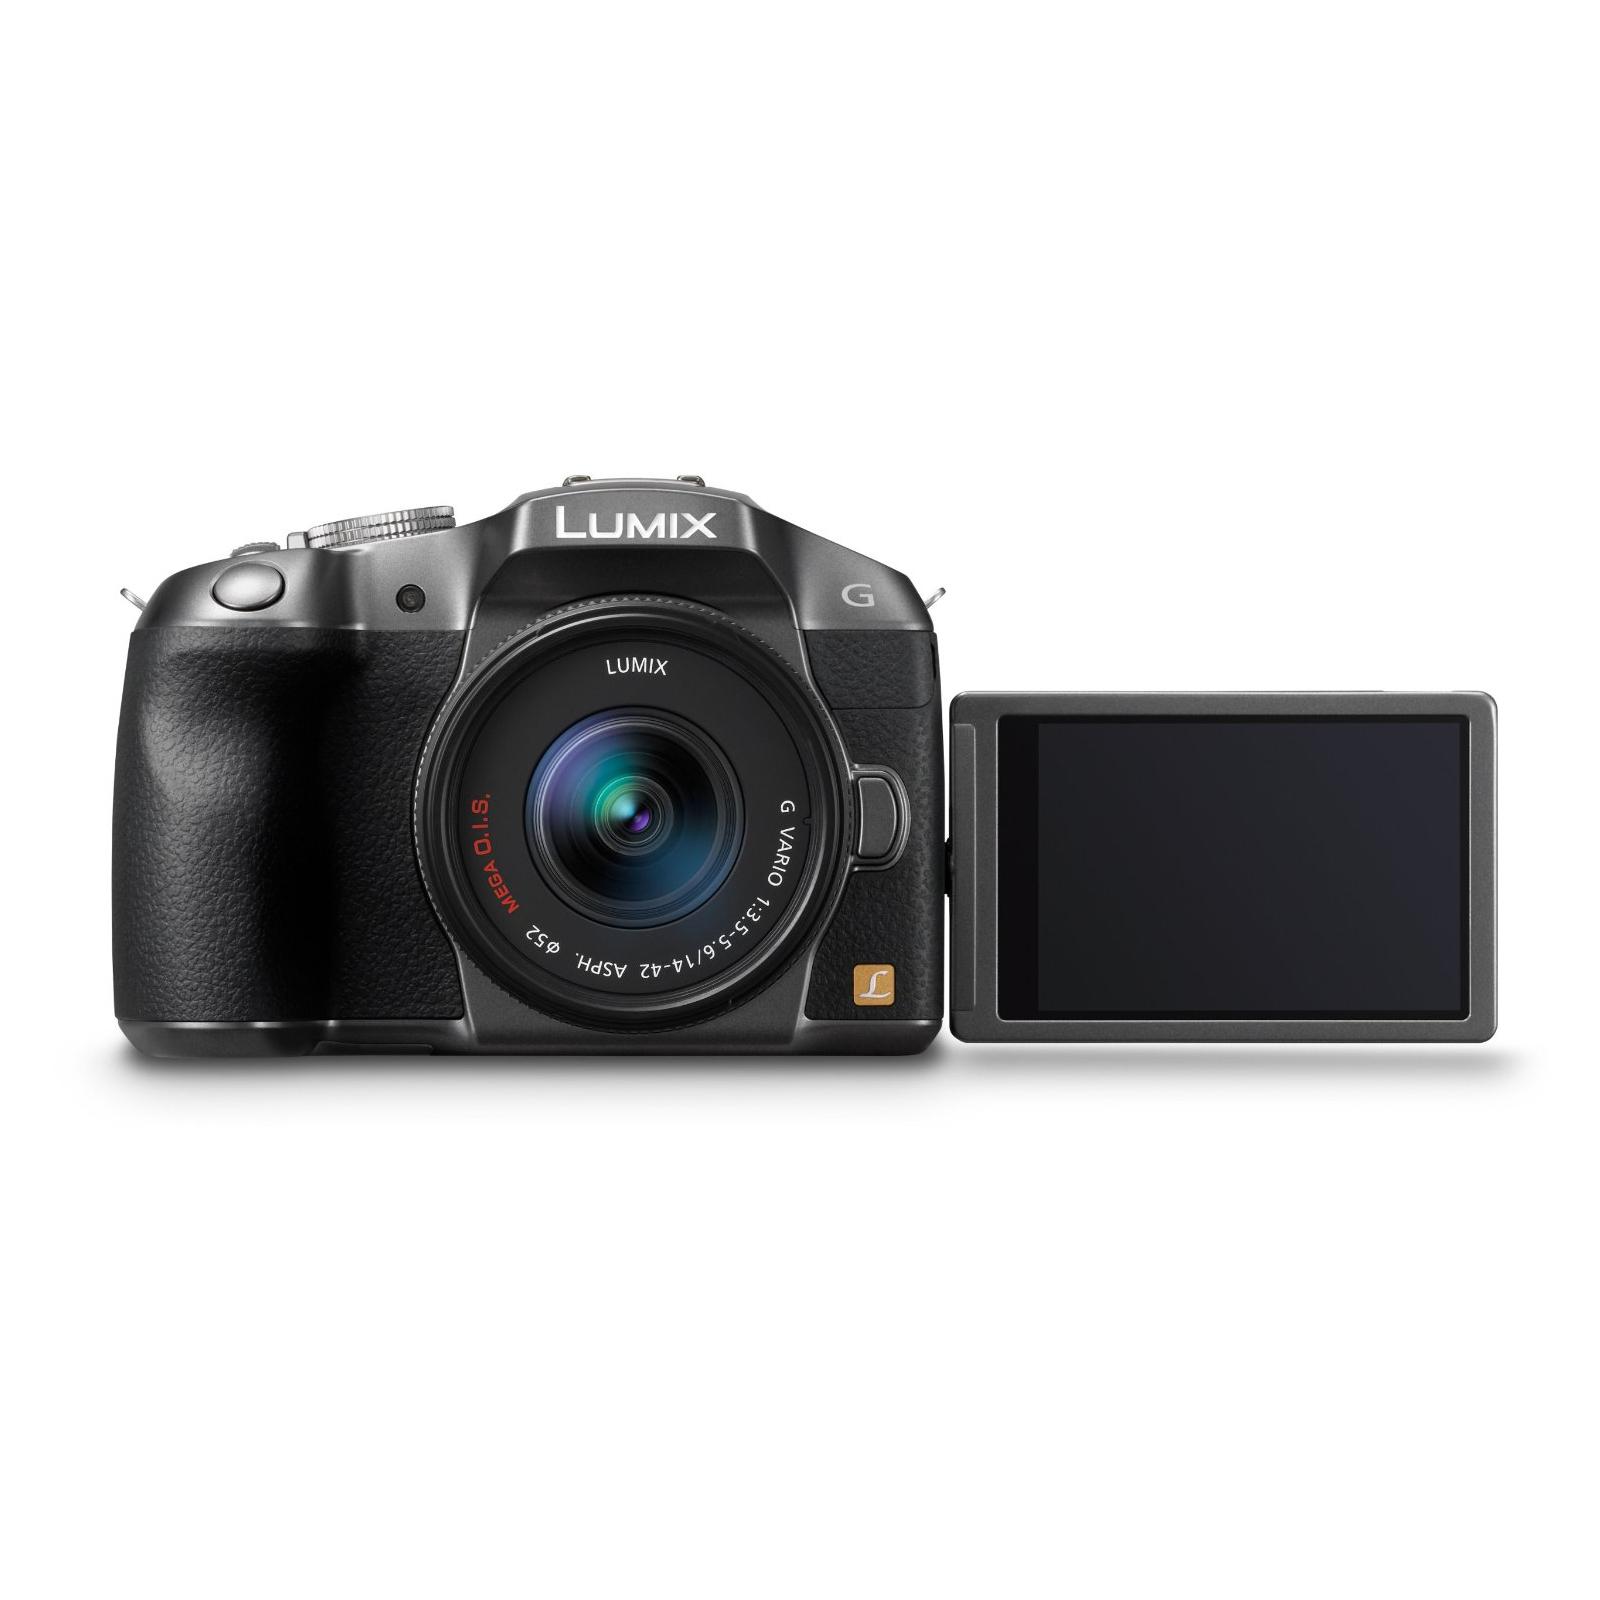 Цифровой фотоаппарат PANASONIC DMC-G6 silver 14-42 kit (DMC-G6KEE-S) изображение 3